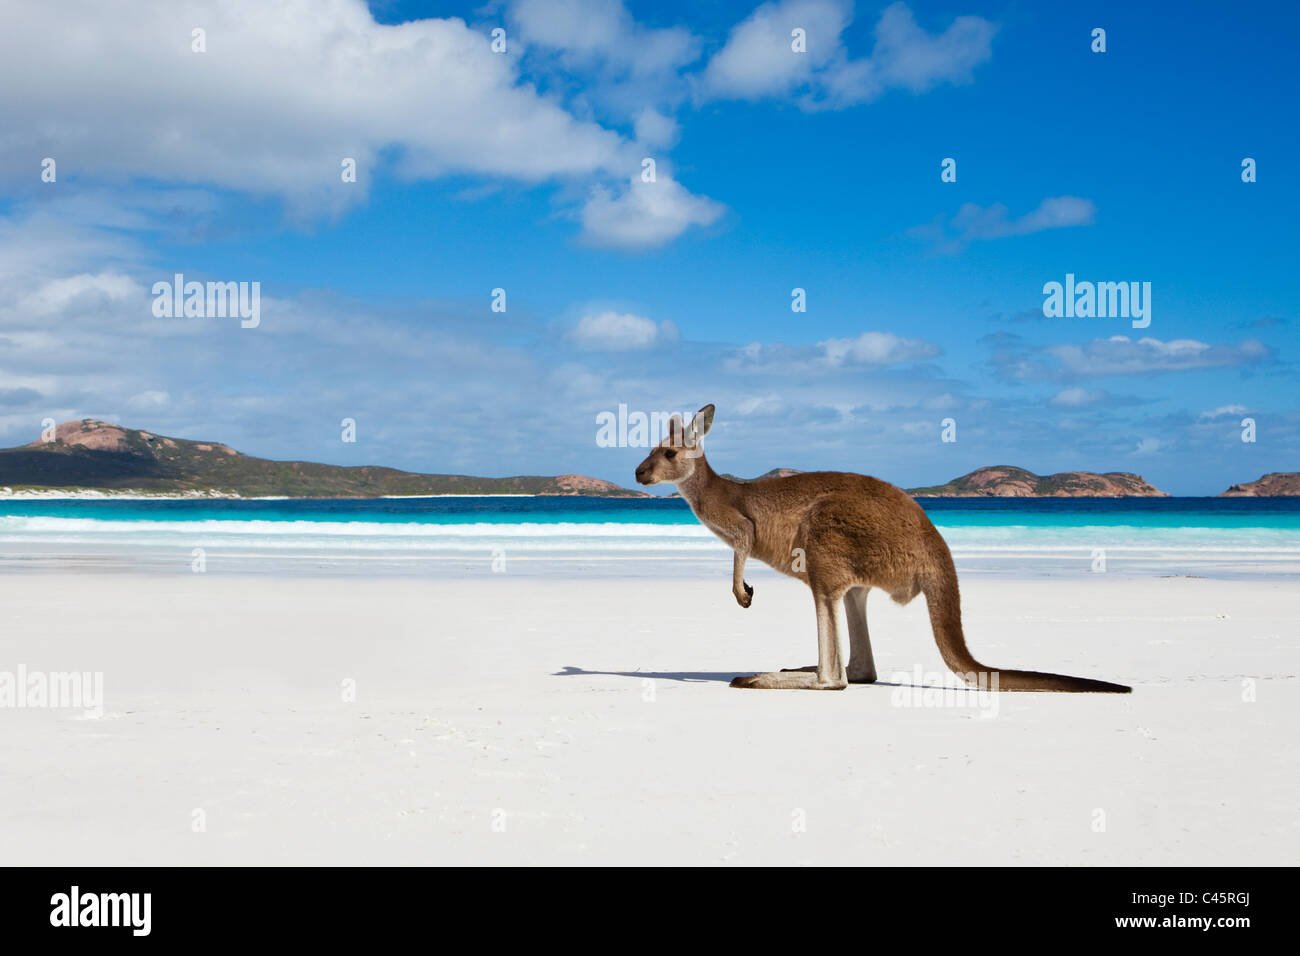 Sur Kangaroo beach à Lucky Bay. Cape Le Grand National Park, Esperance, Western Australia, Australia Photo Stock